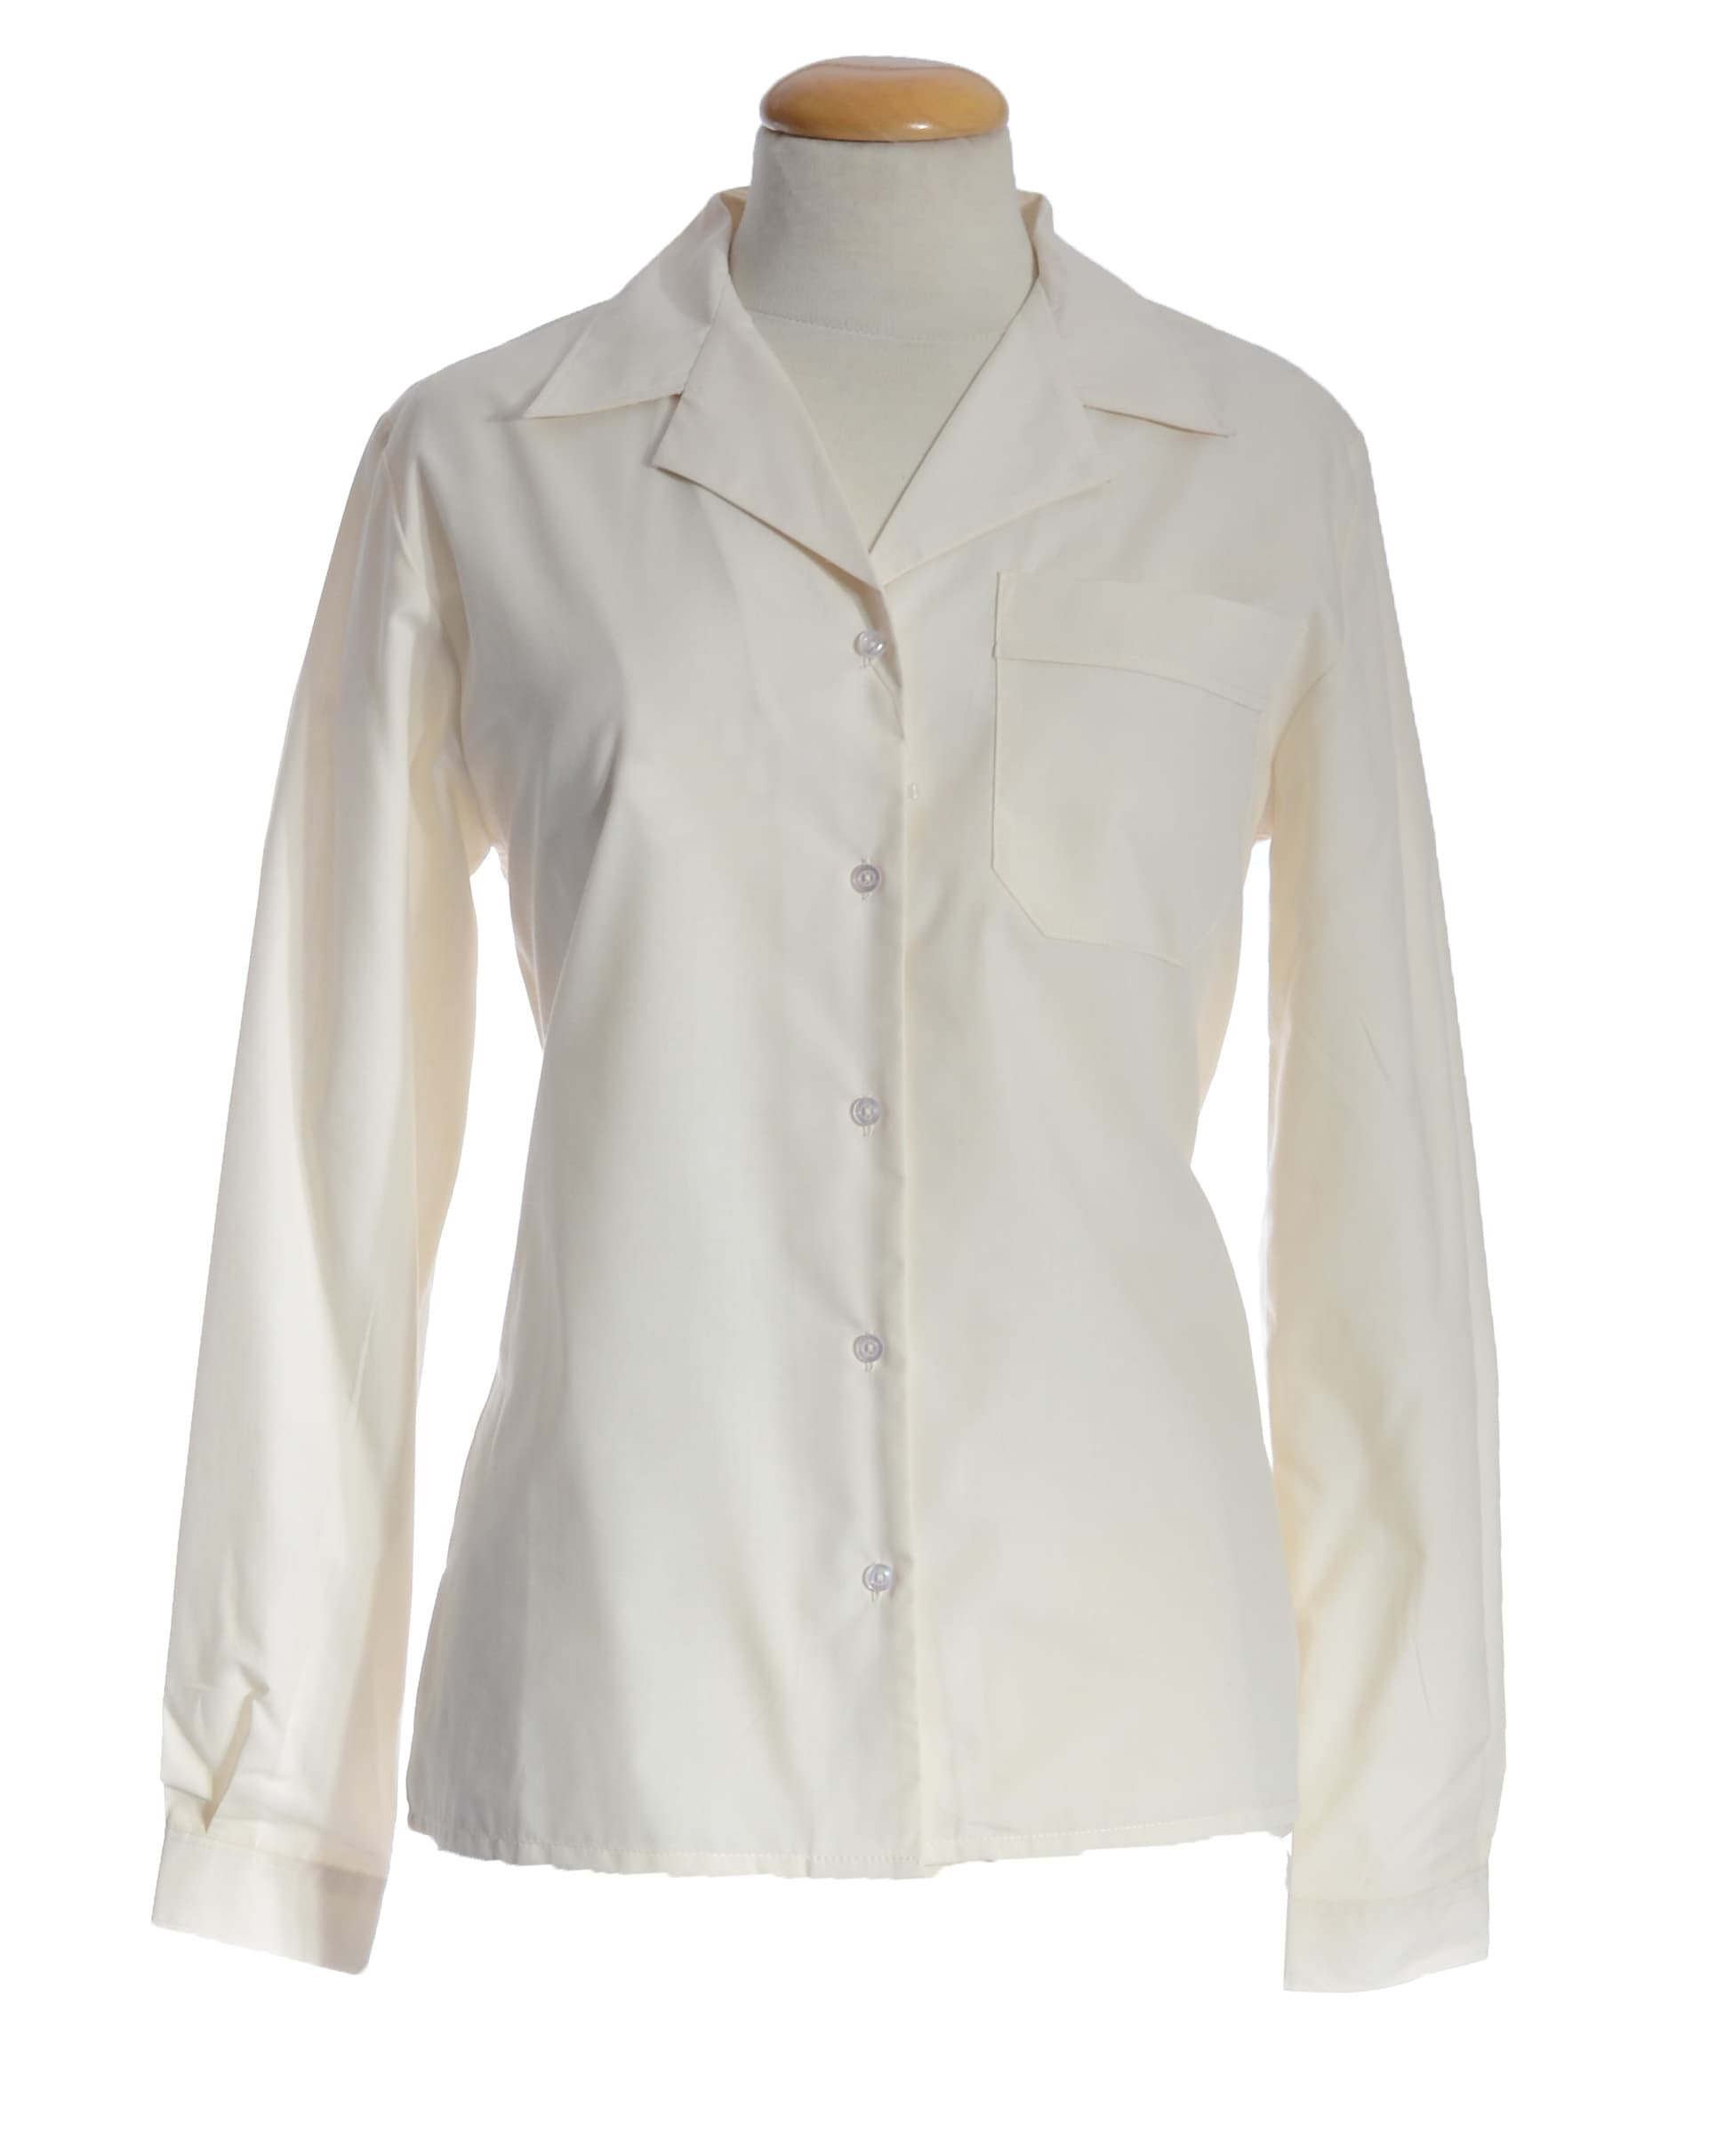 Cream Long Sleeve Blouse 23